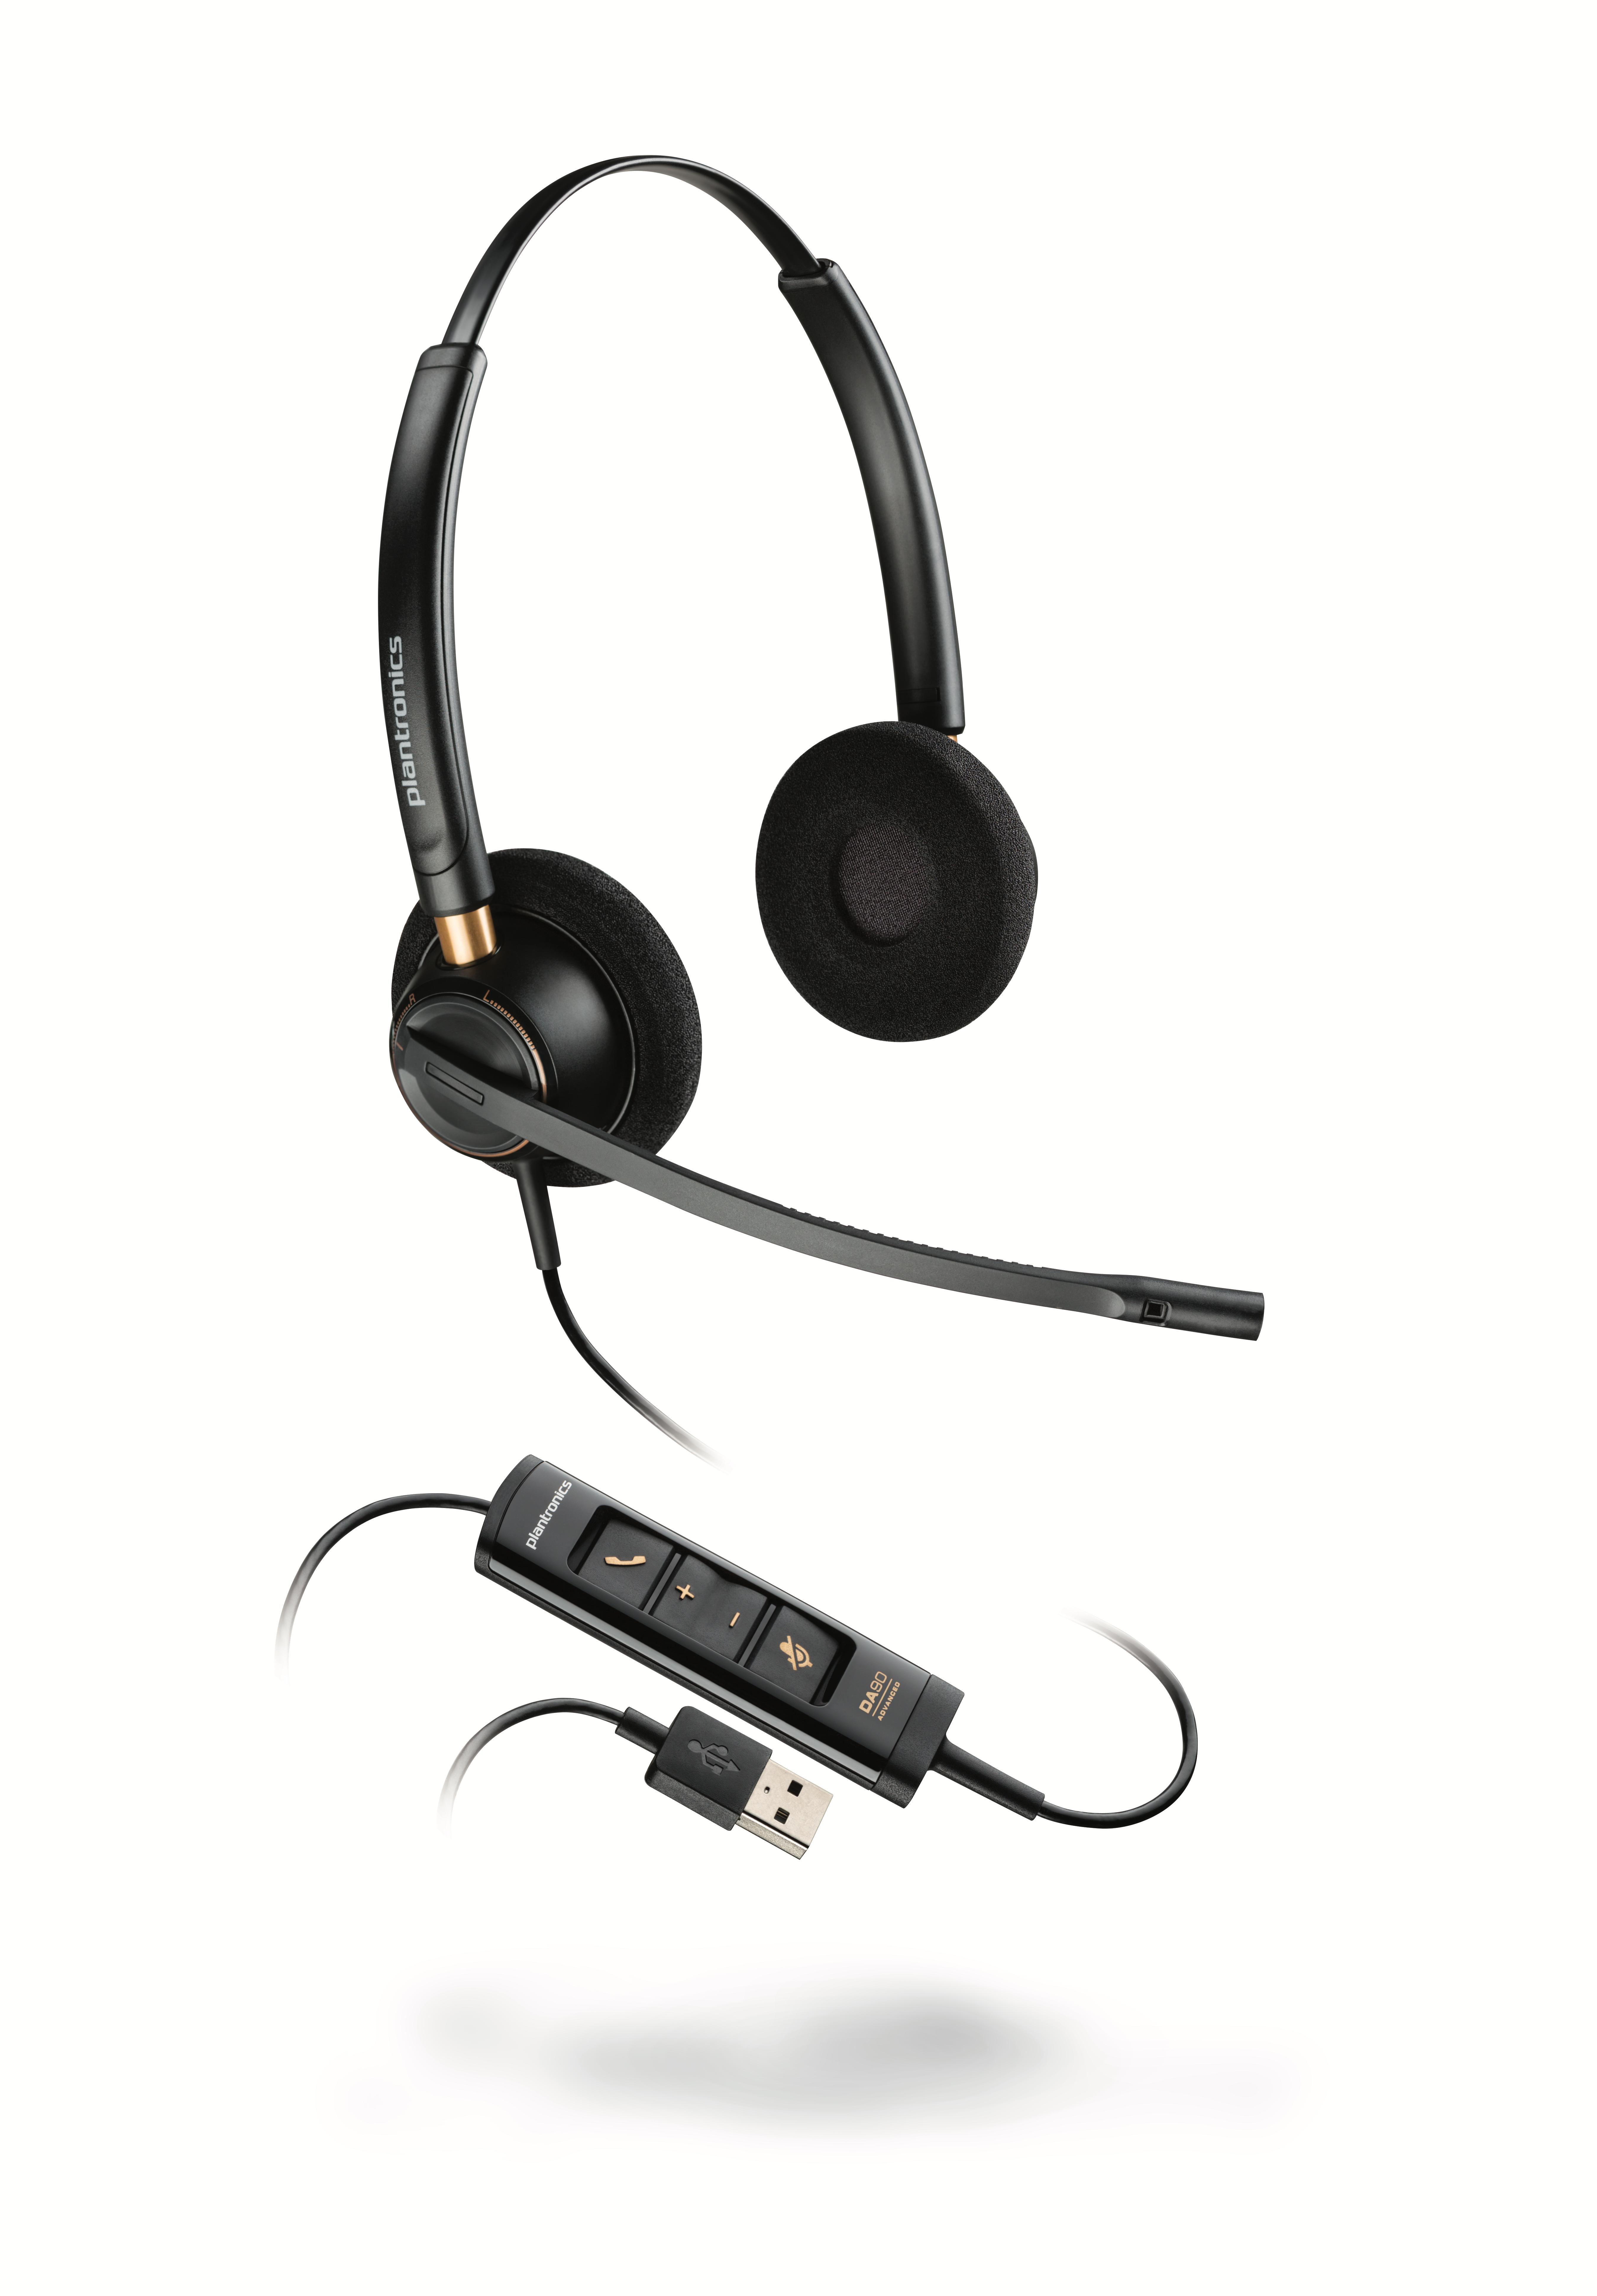 EncorePro 500 USB Series Corded USB Headset